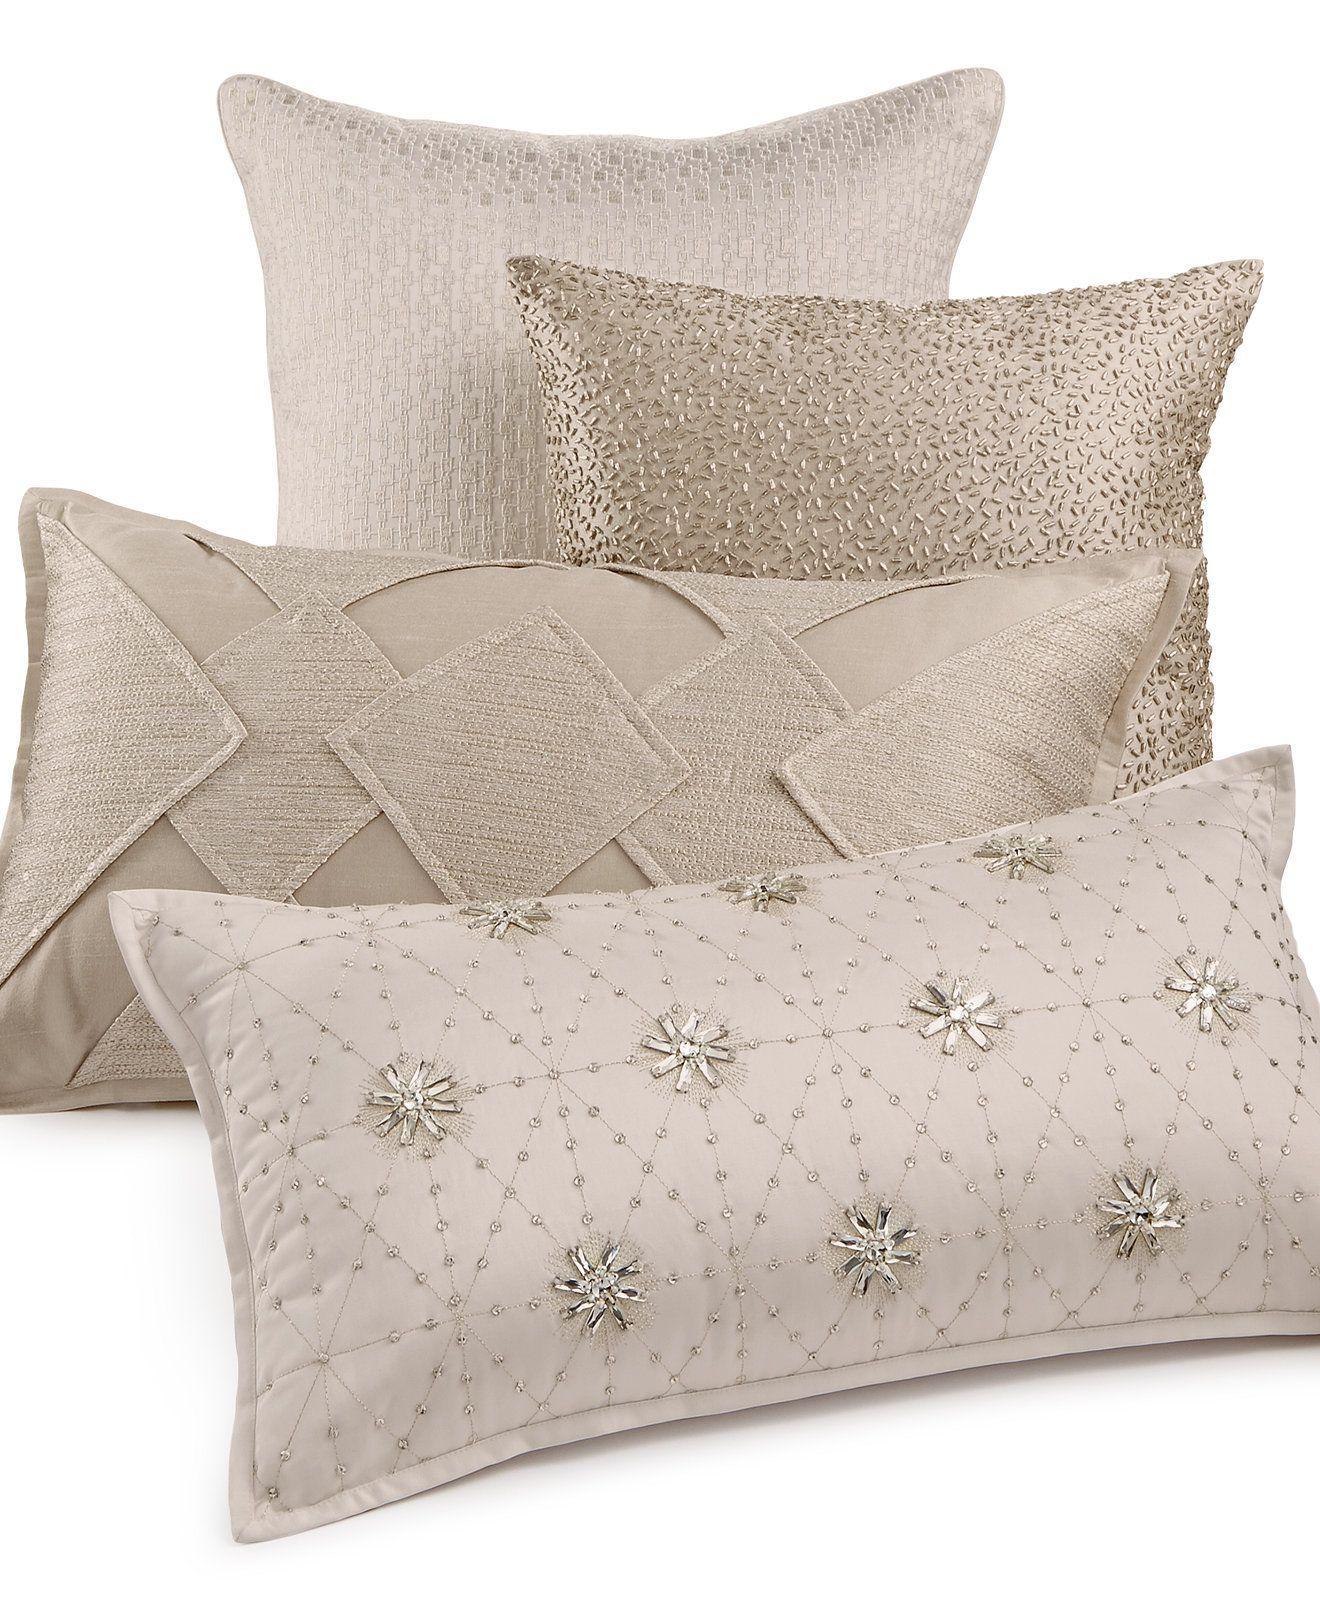 Hotel Collection Finest Sunburst Decorative Pillow